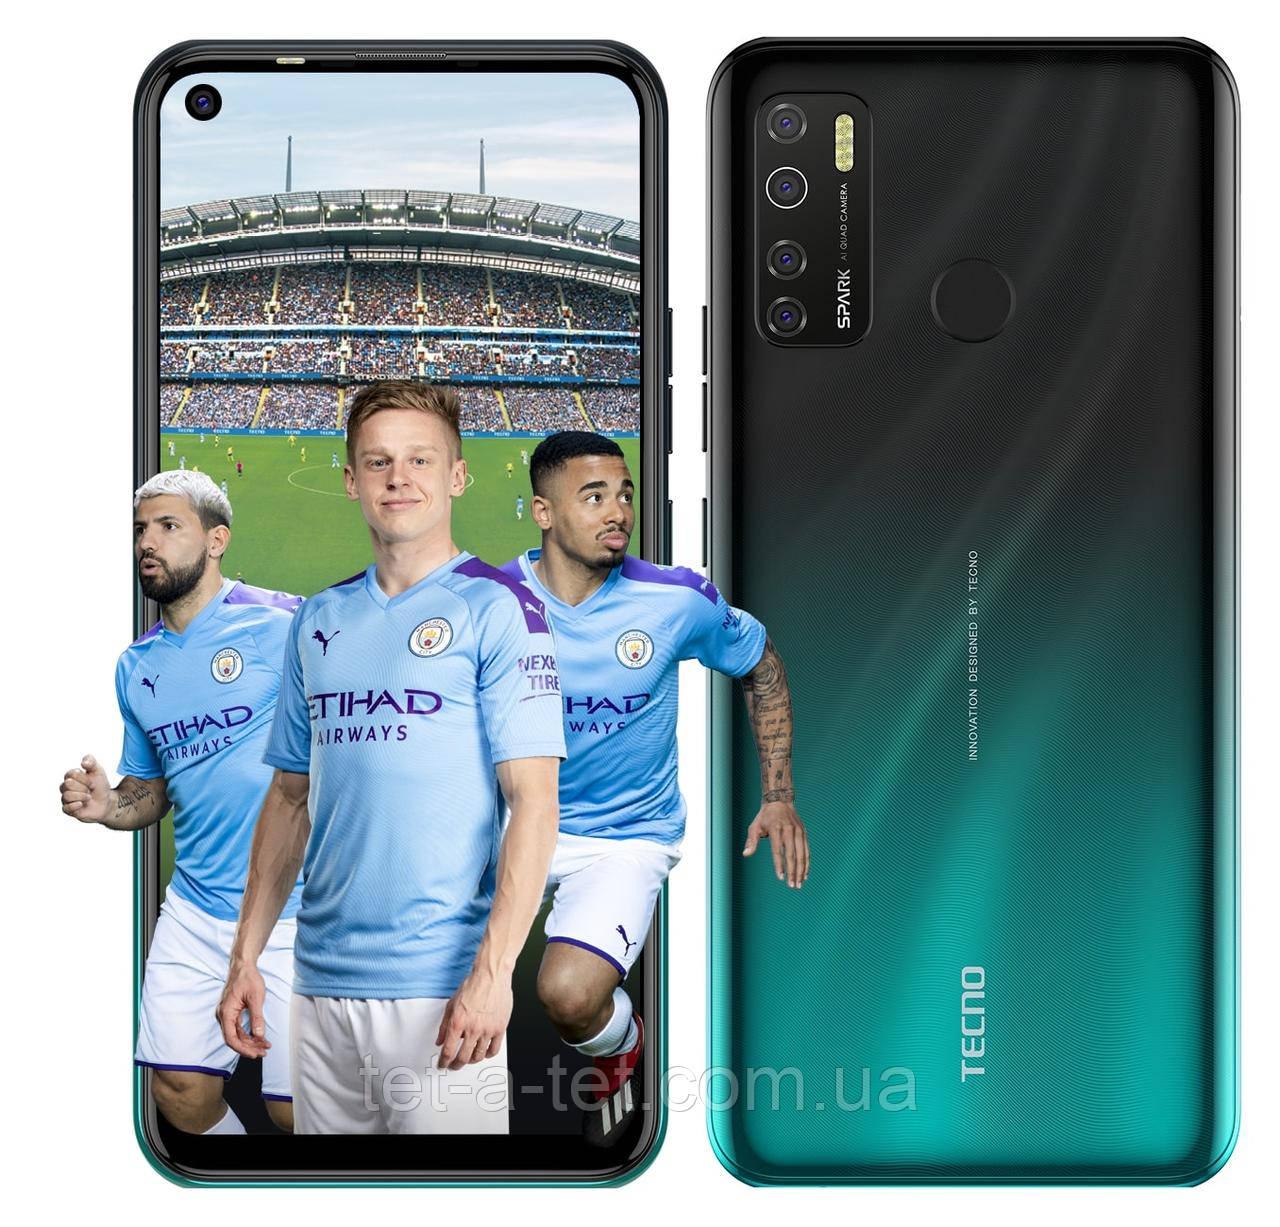 Смартфон TECNO Spark 5 Pro (KD7) 4/128GB Ice Jadeite (UA UCRF)